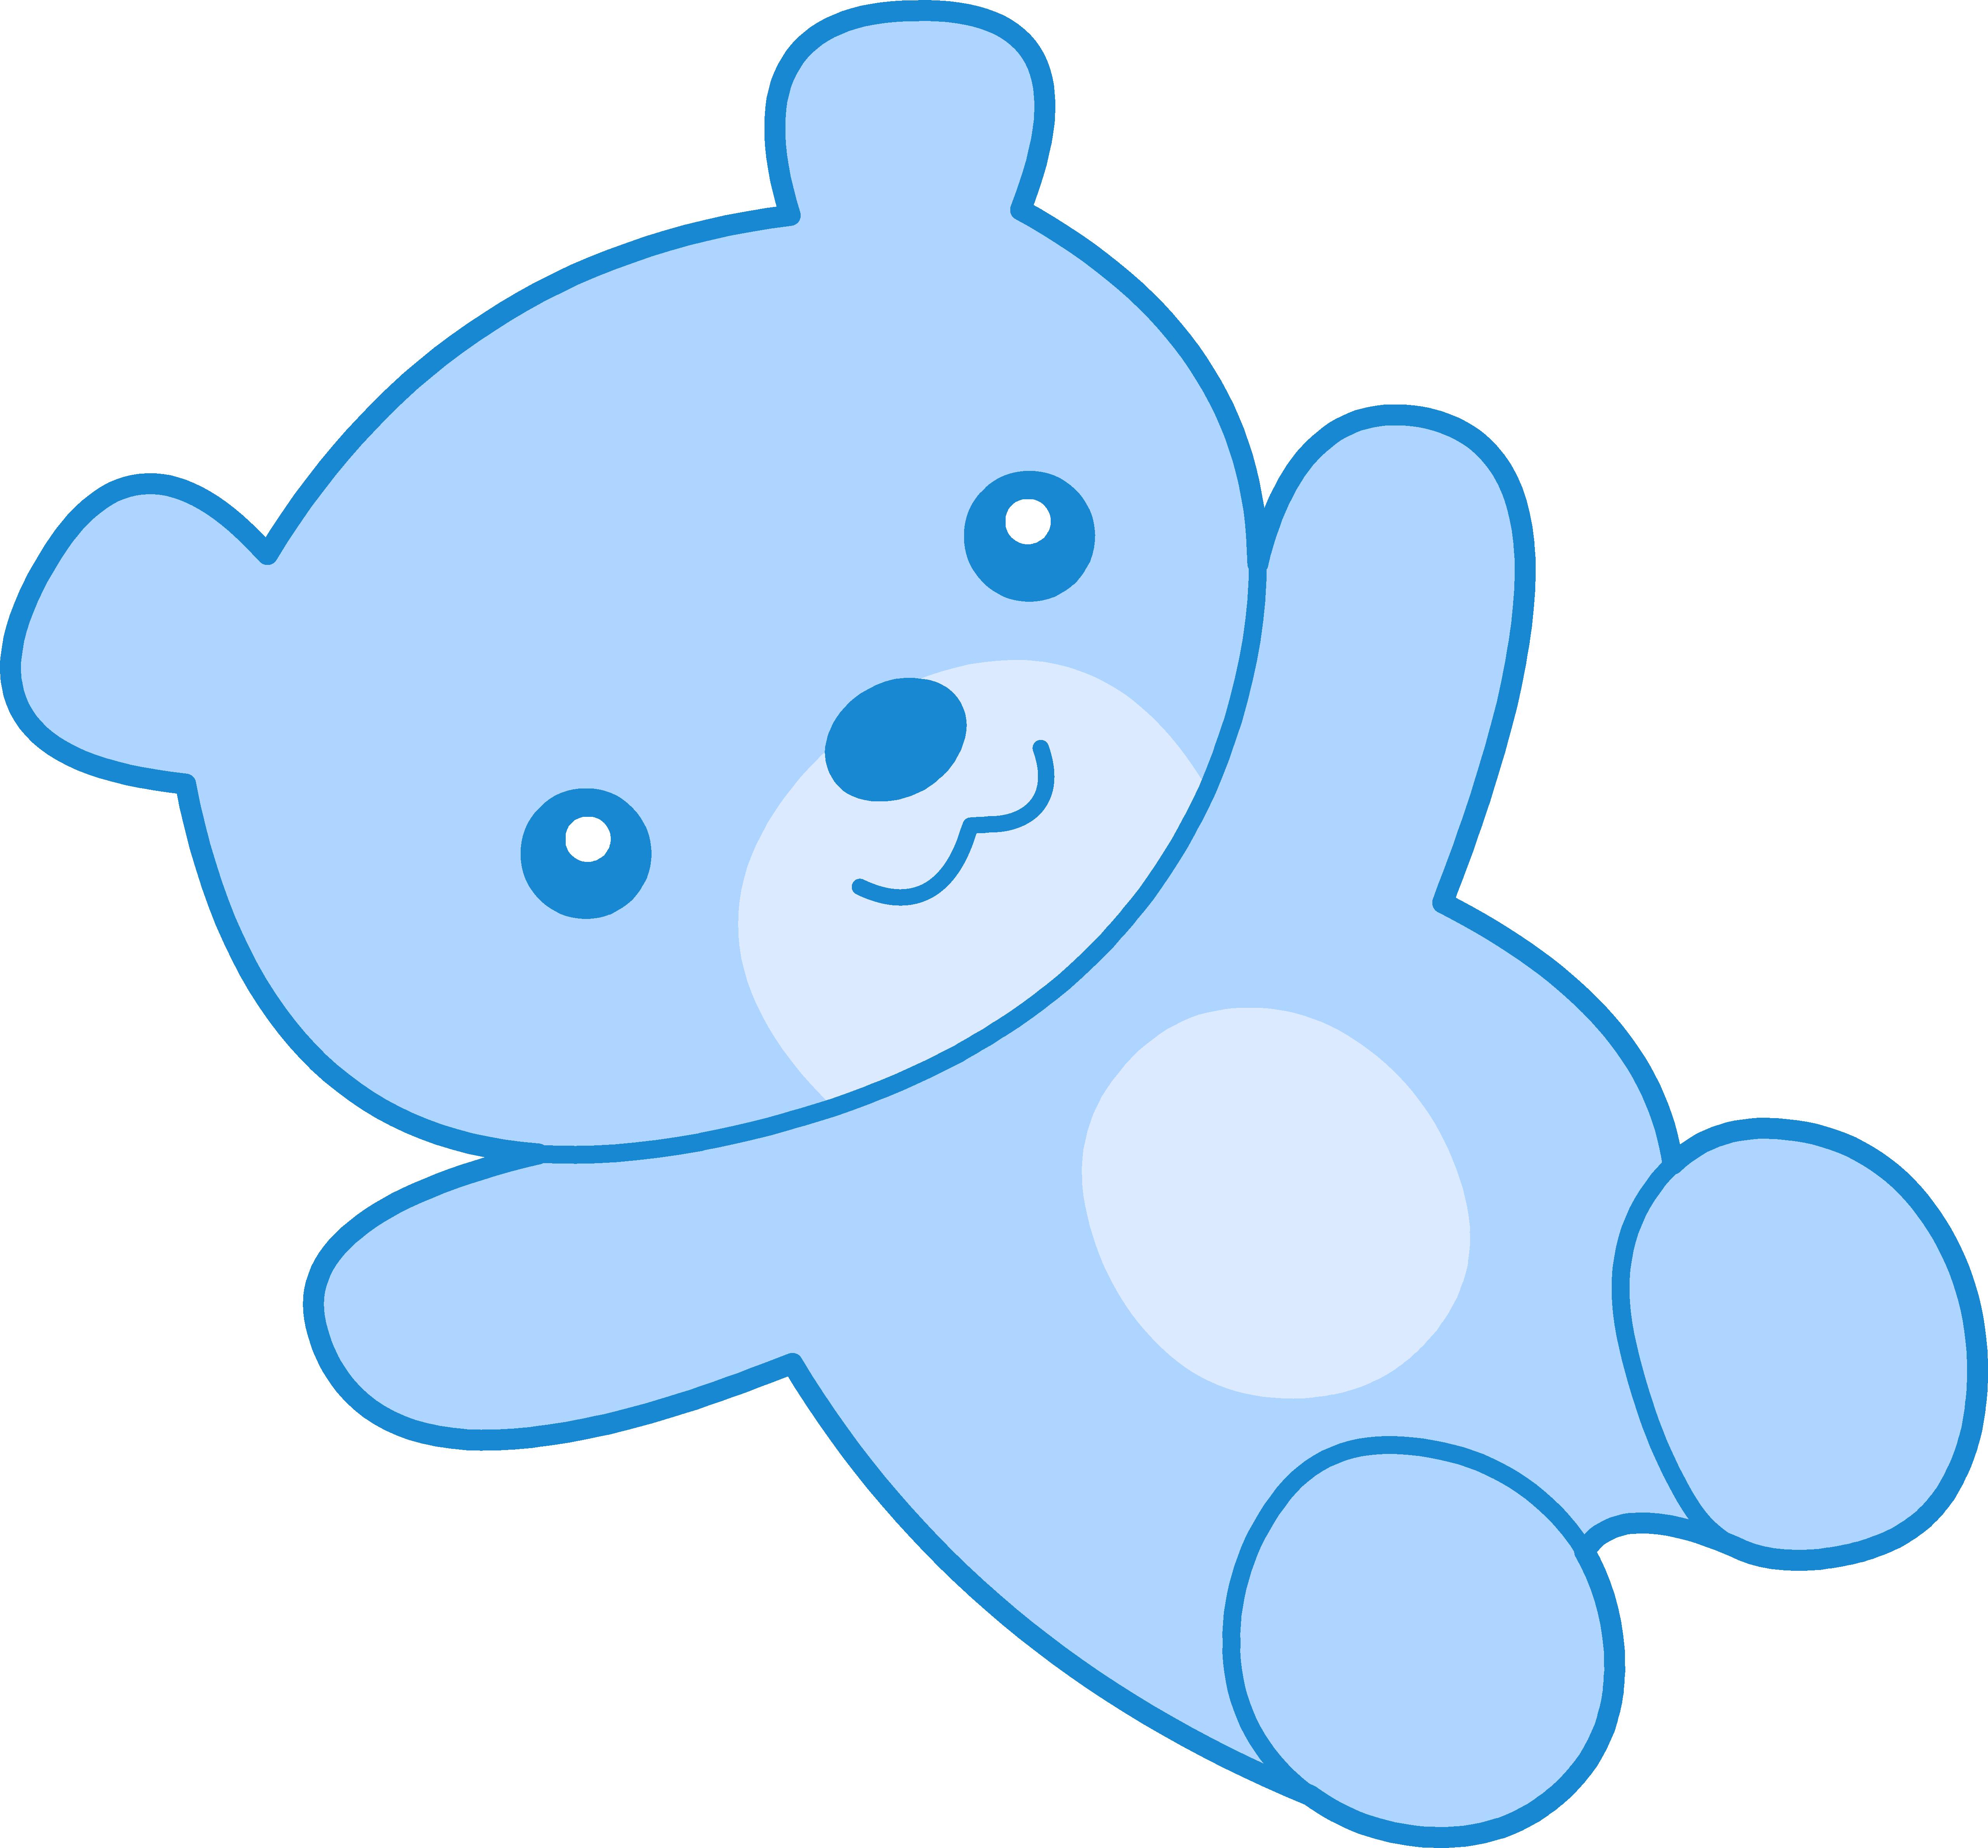 5120x4760 Cute Blue Teddy Bear Clipart